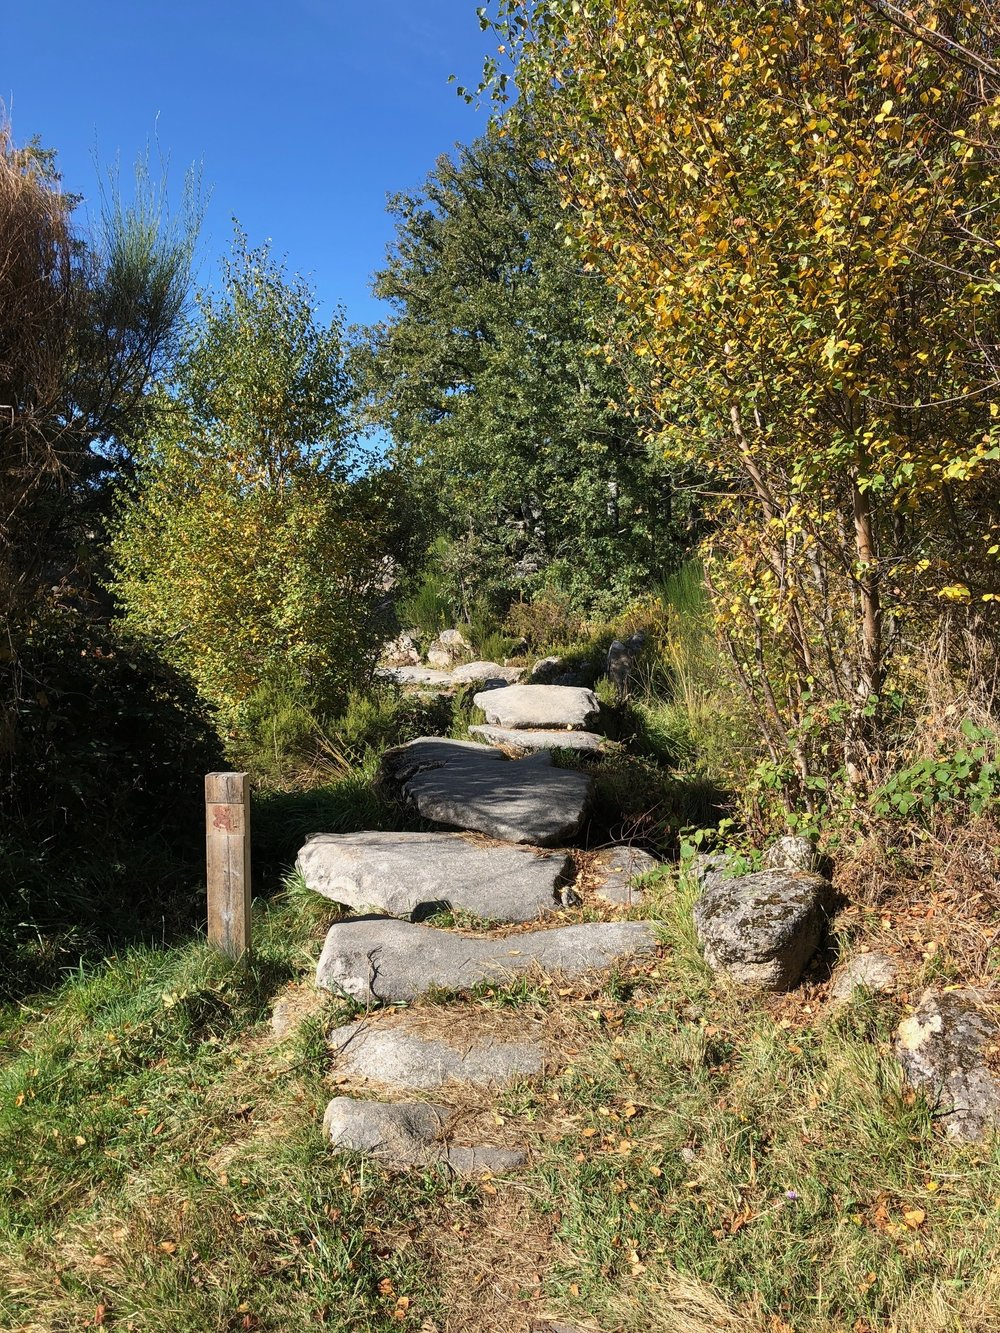 A bridge of stepping stones